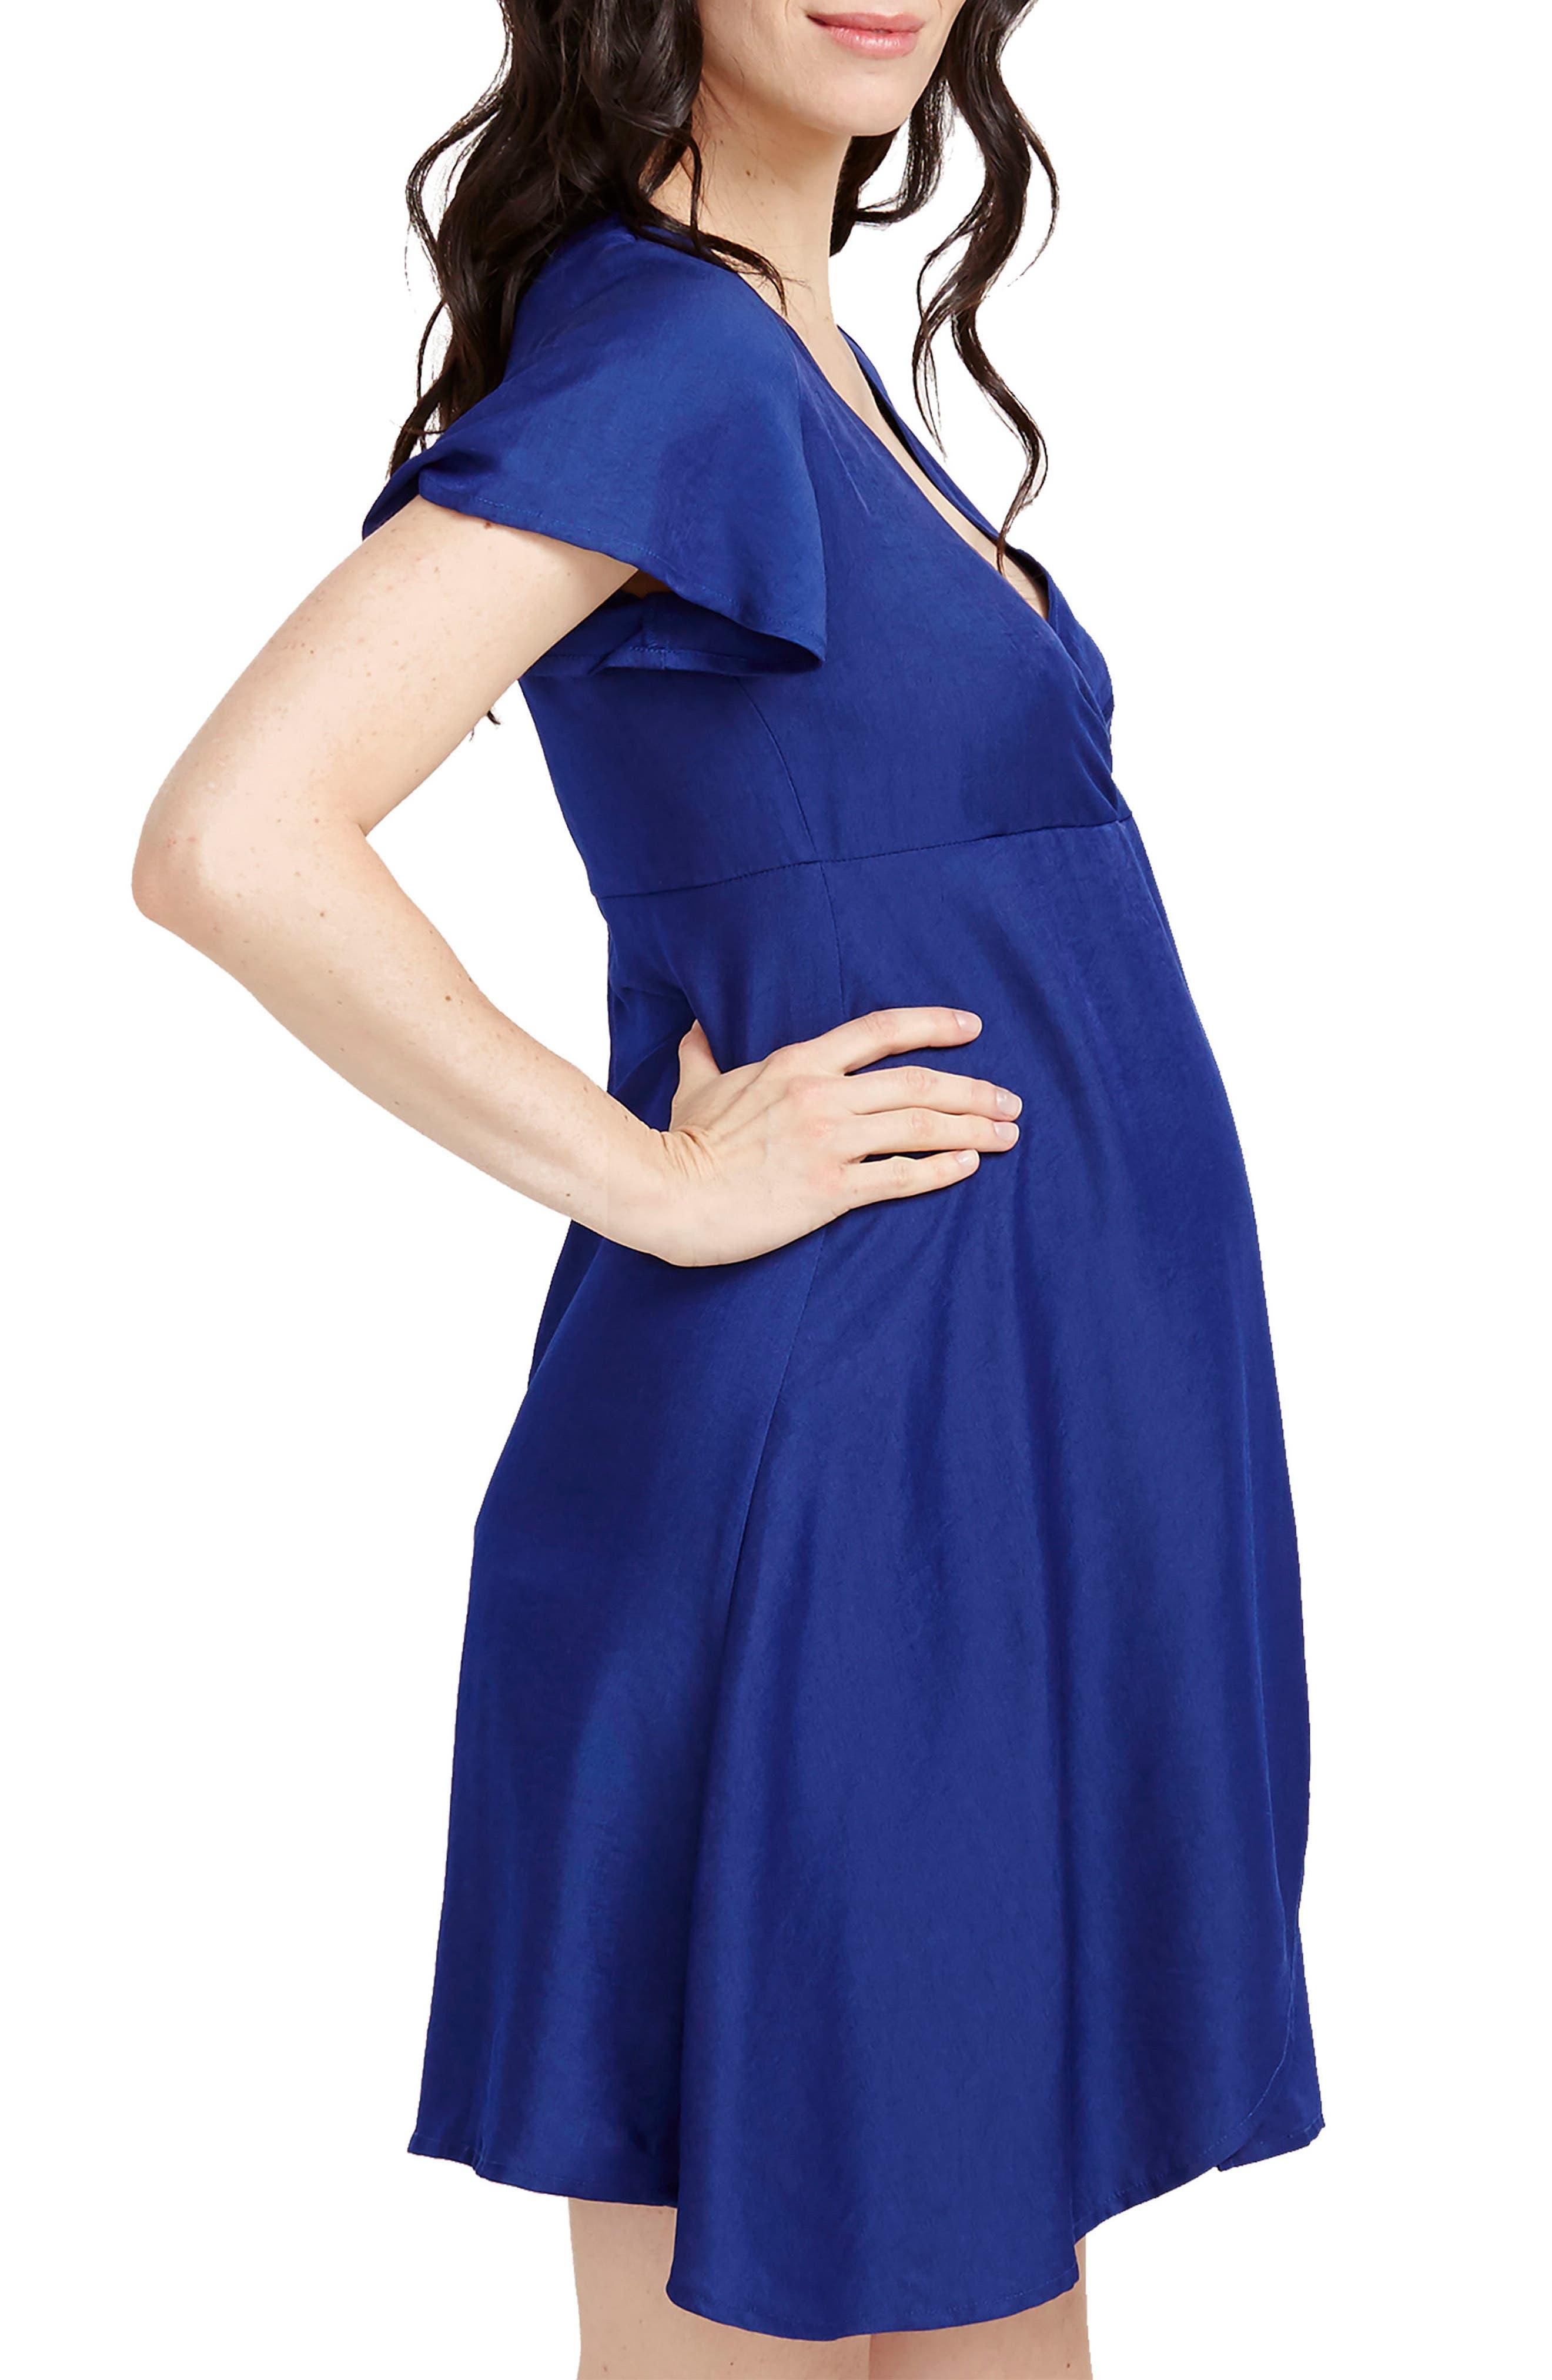 ROSIE POPE,                             Grace Maternity Dress,                             Alternate thumbnail 3, color,                             410